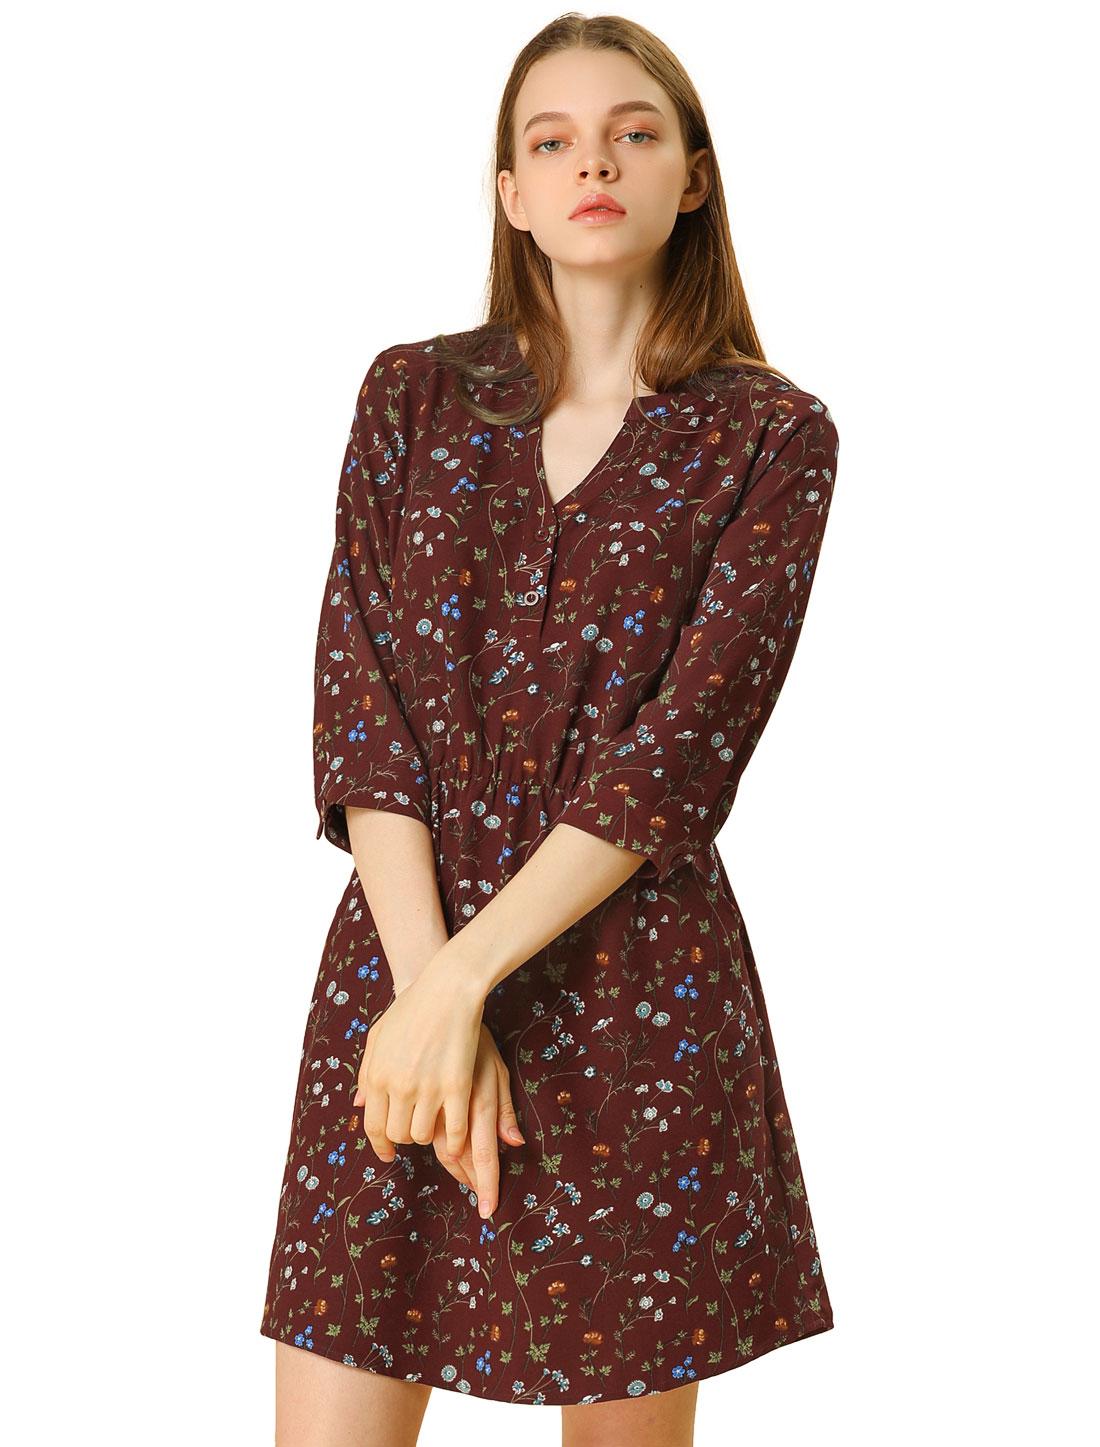 Allegra K Women Button Down V Neck Side Pockets Floral Dress Purplish Red XS